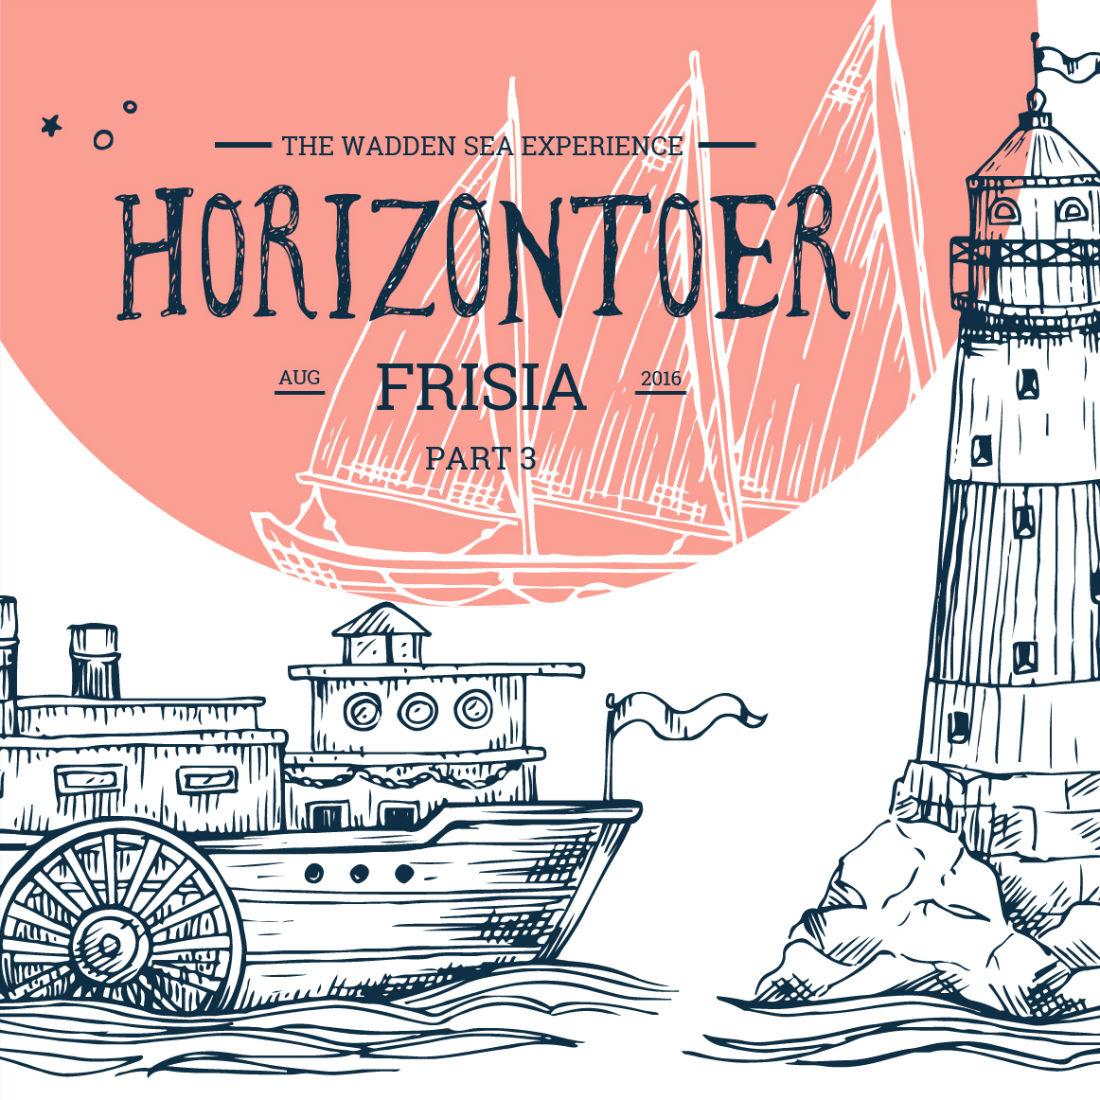 Horizontoer Festival Netherlands Lomoherz